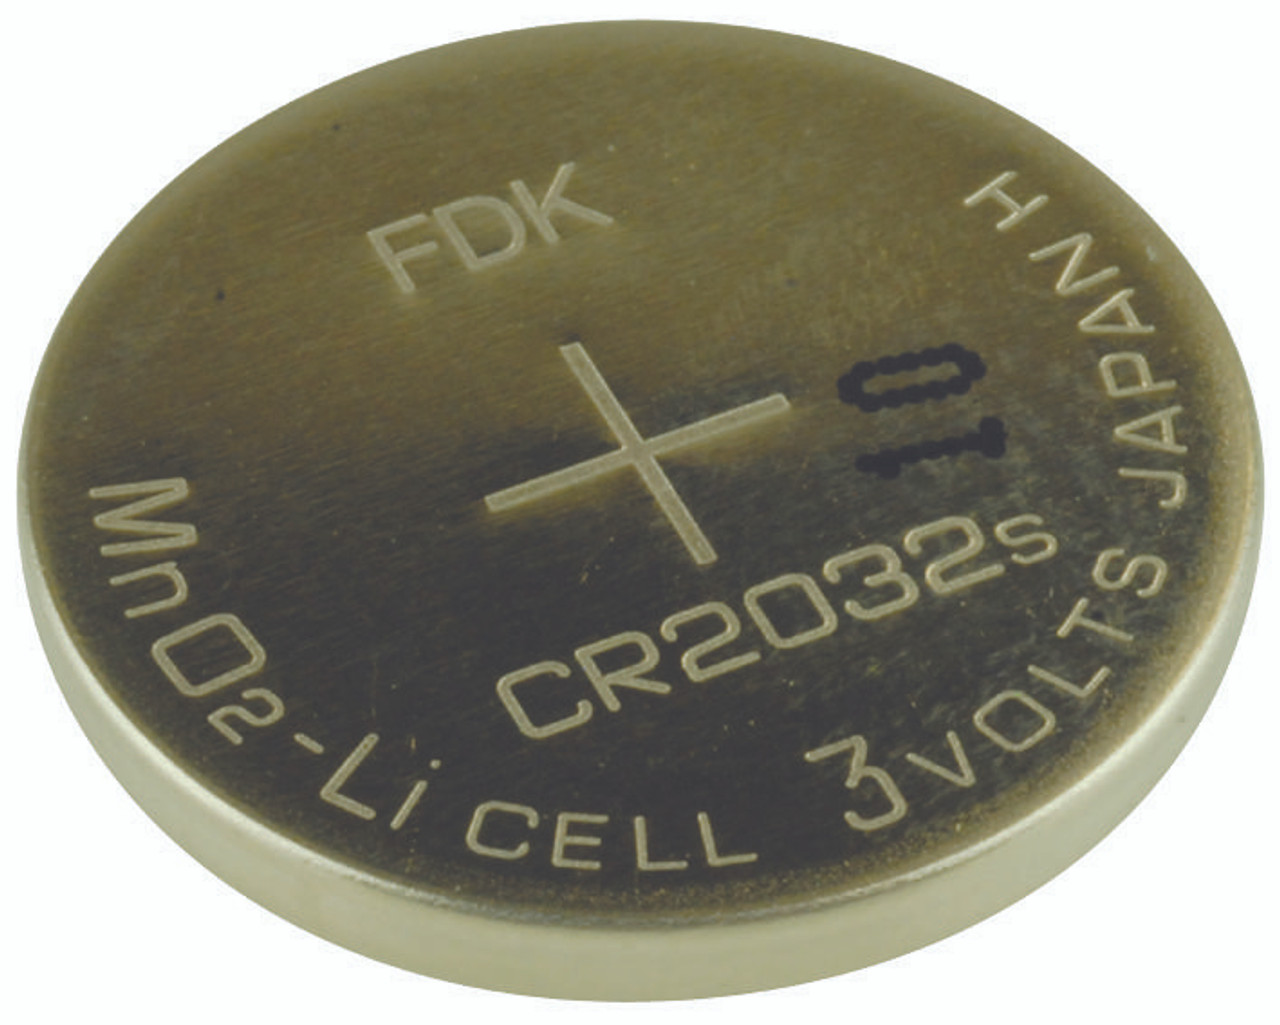 FDK CR2032 165mAh 3V Lithium (LiMnO2) Coin Cell Battery - Bulk